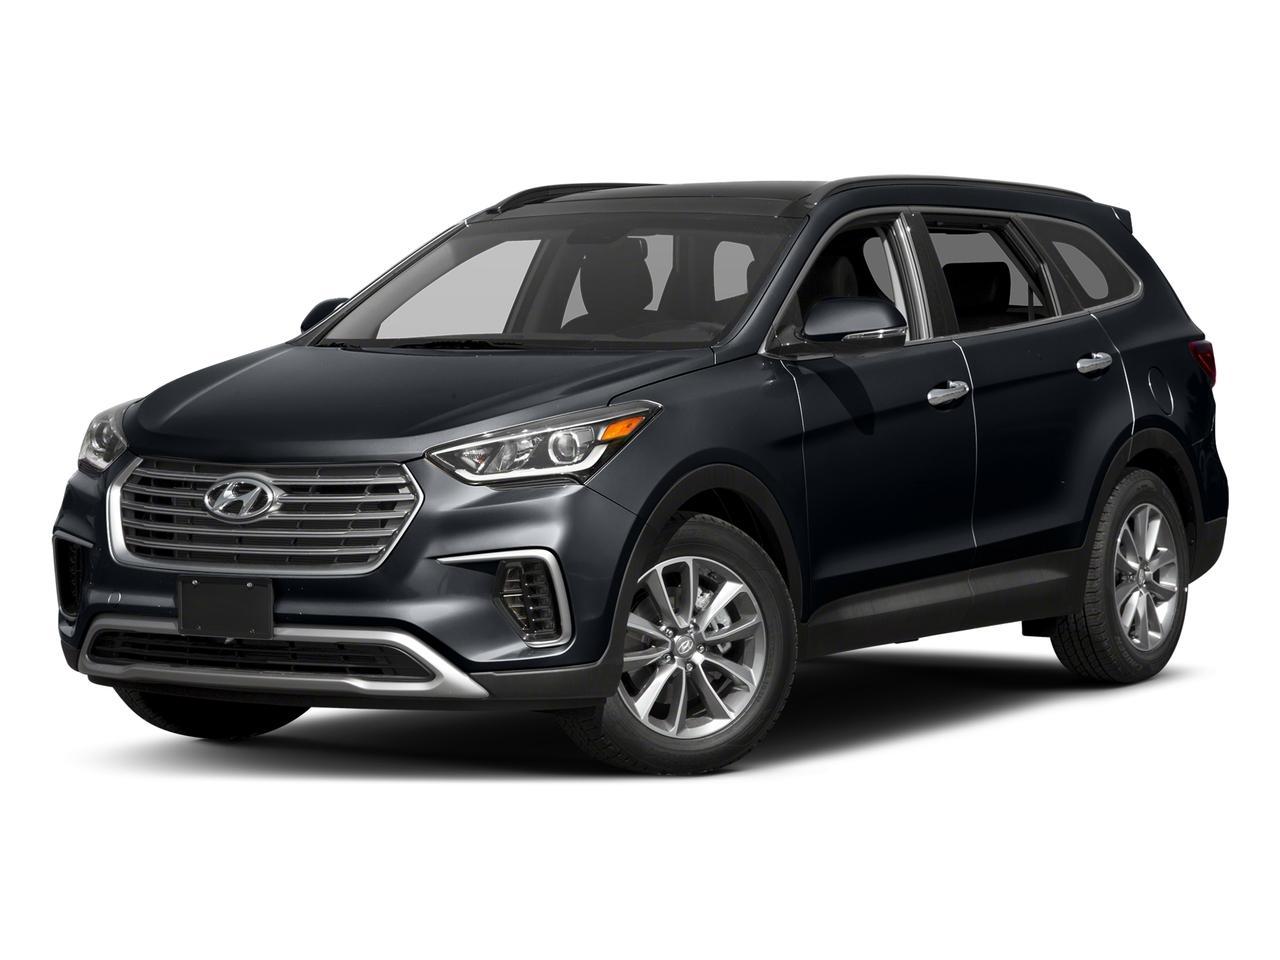 2018 Hyundai Santa Fe Vehicle Photo in Tulsa, OK 74133